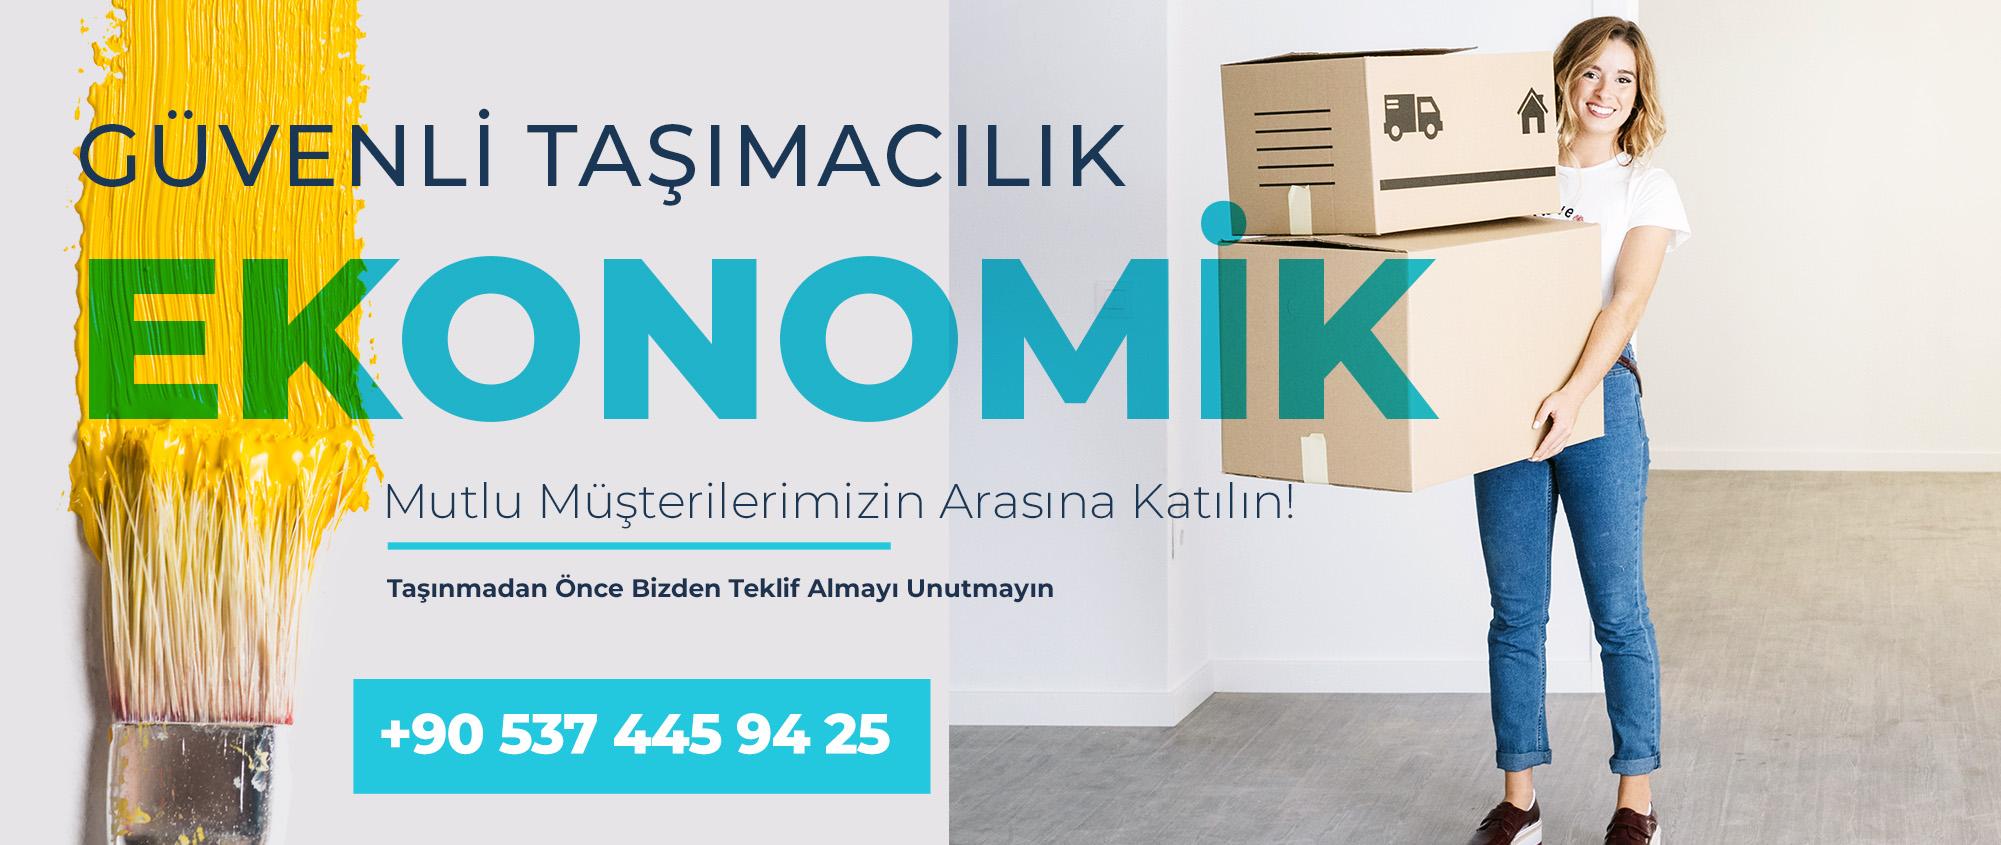 Ucuz Nakliyeci İstanbul